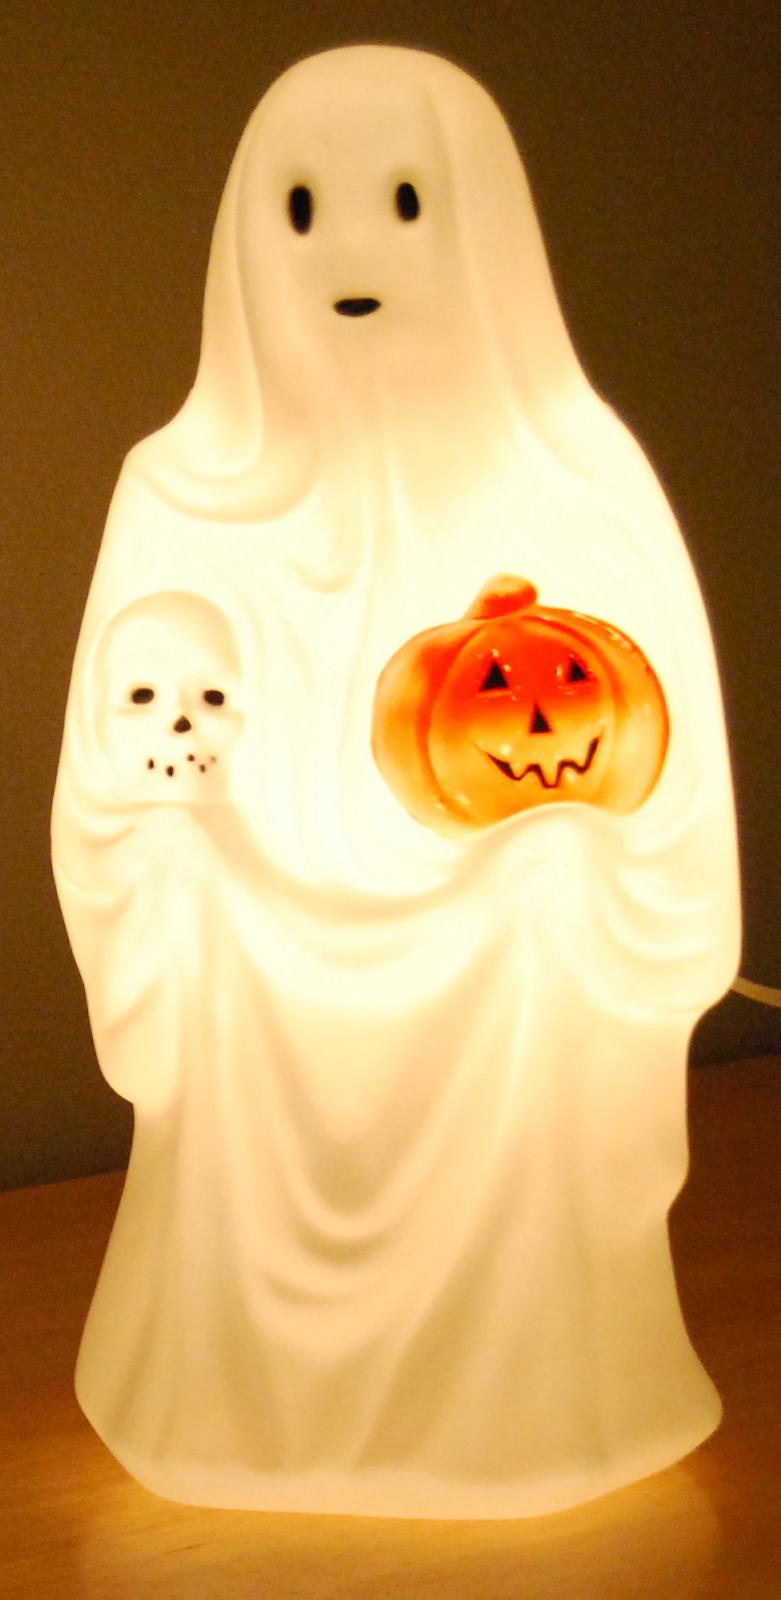 Halloween 2012 ghost